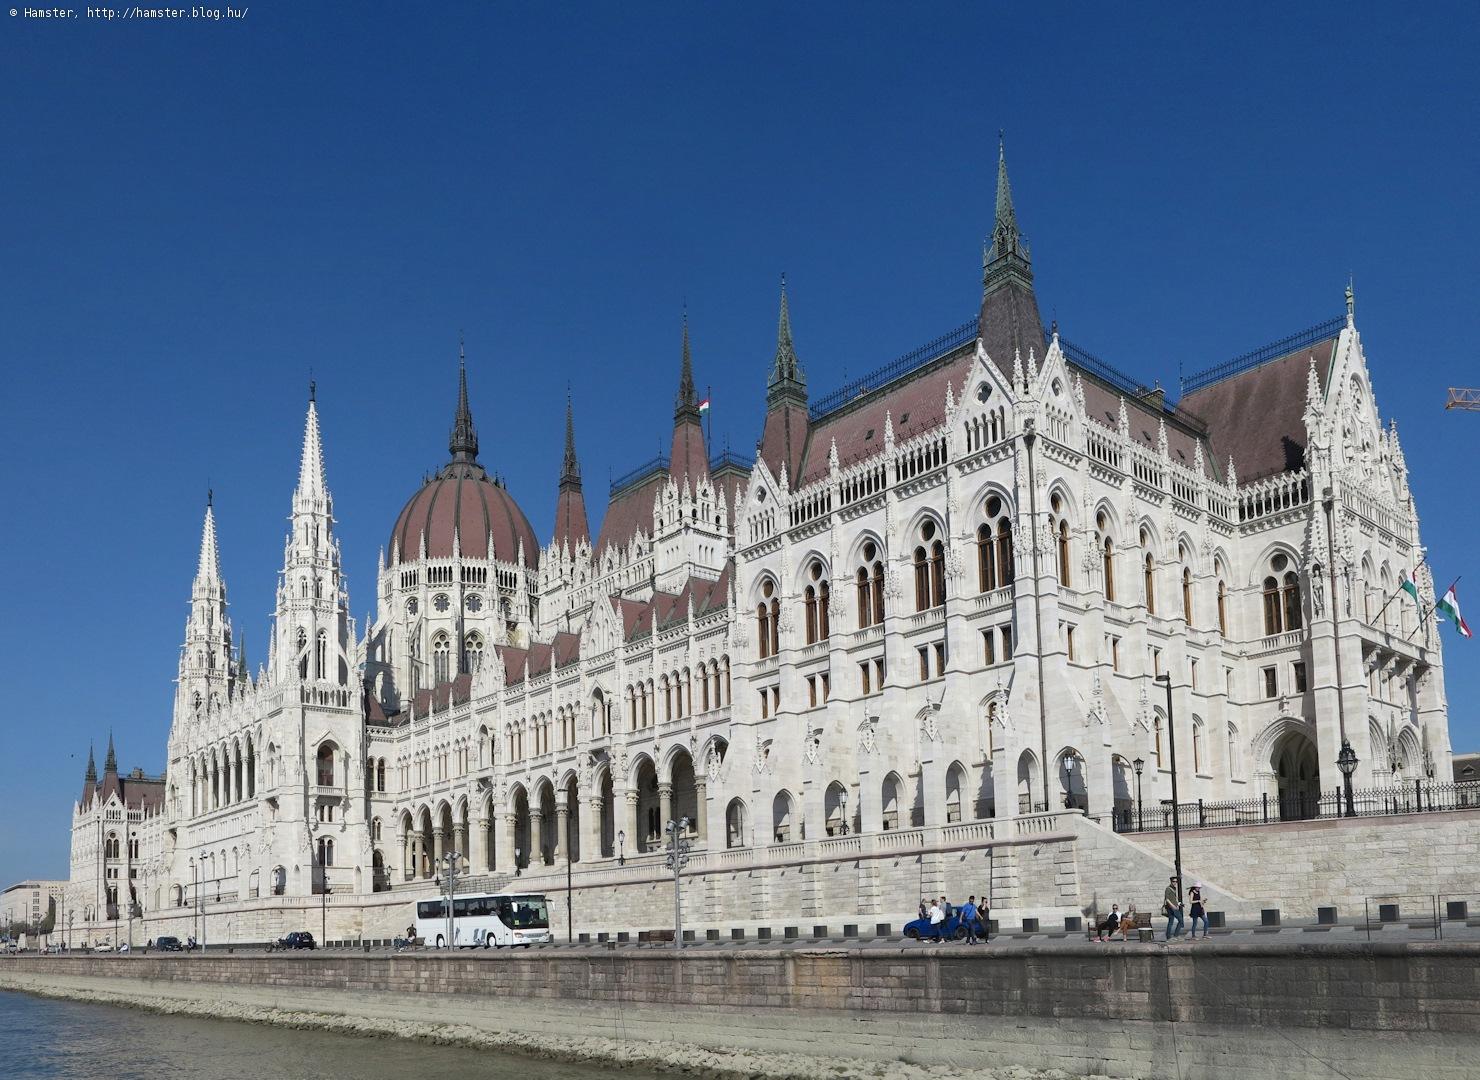 parlament_lentrol_2.jpg